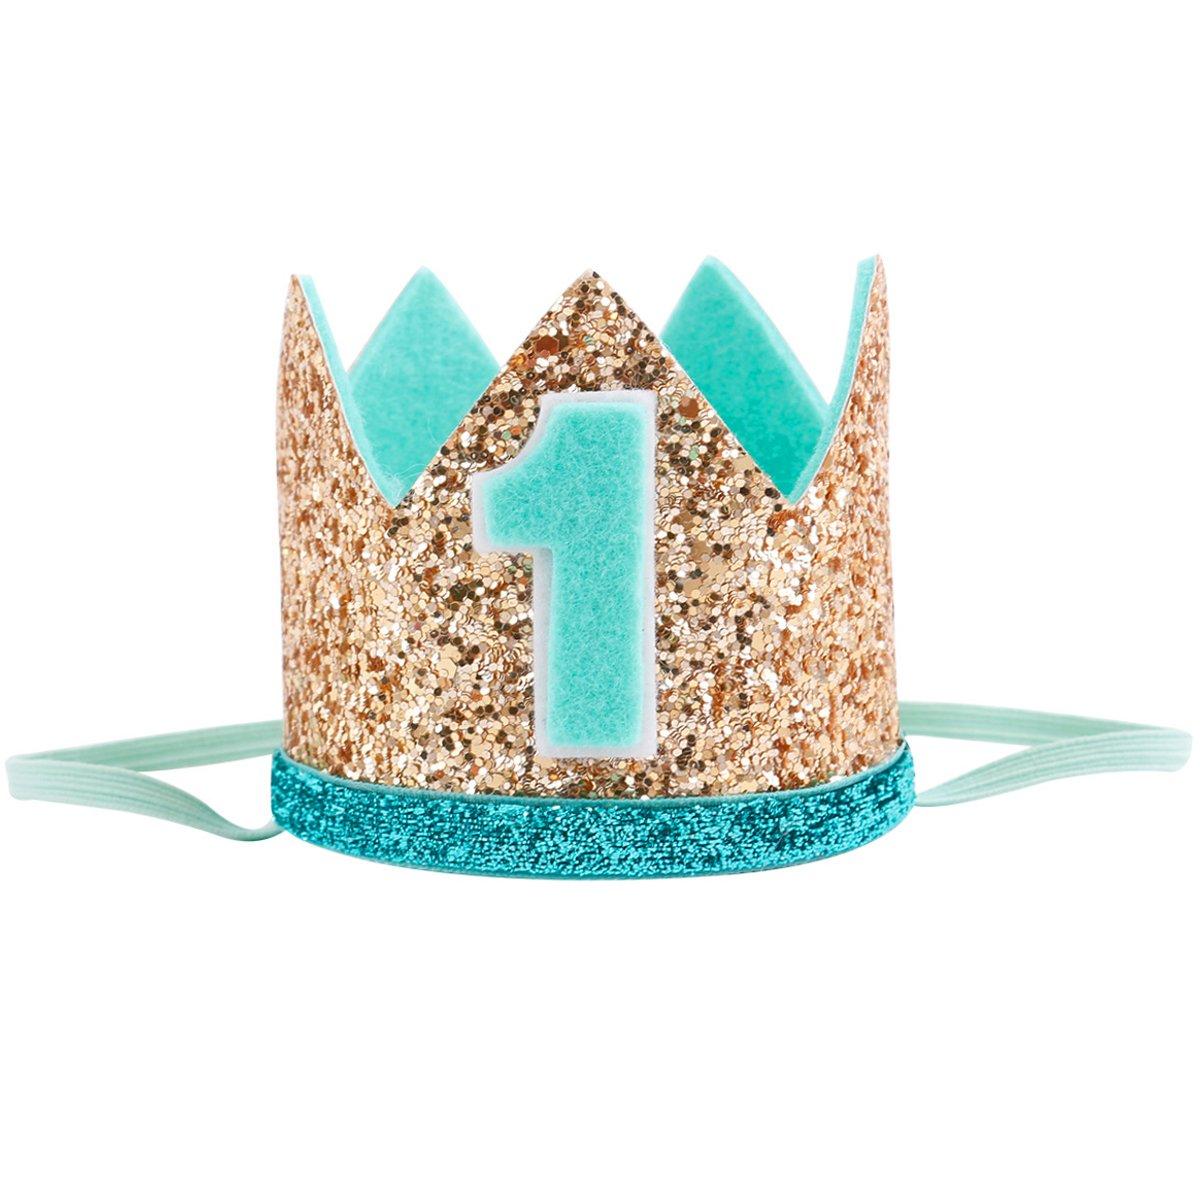 Celebris Glitter Baby Boy First Birthday Crown Hat Headband For Little Prince Princess Cake Smash